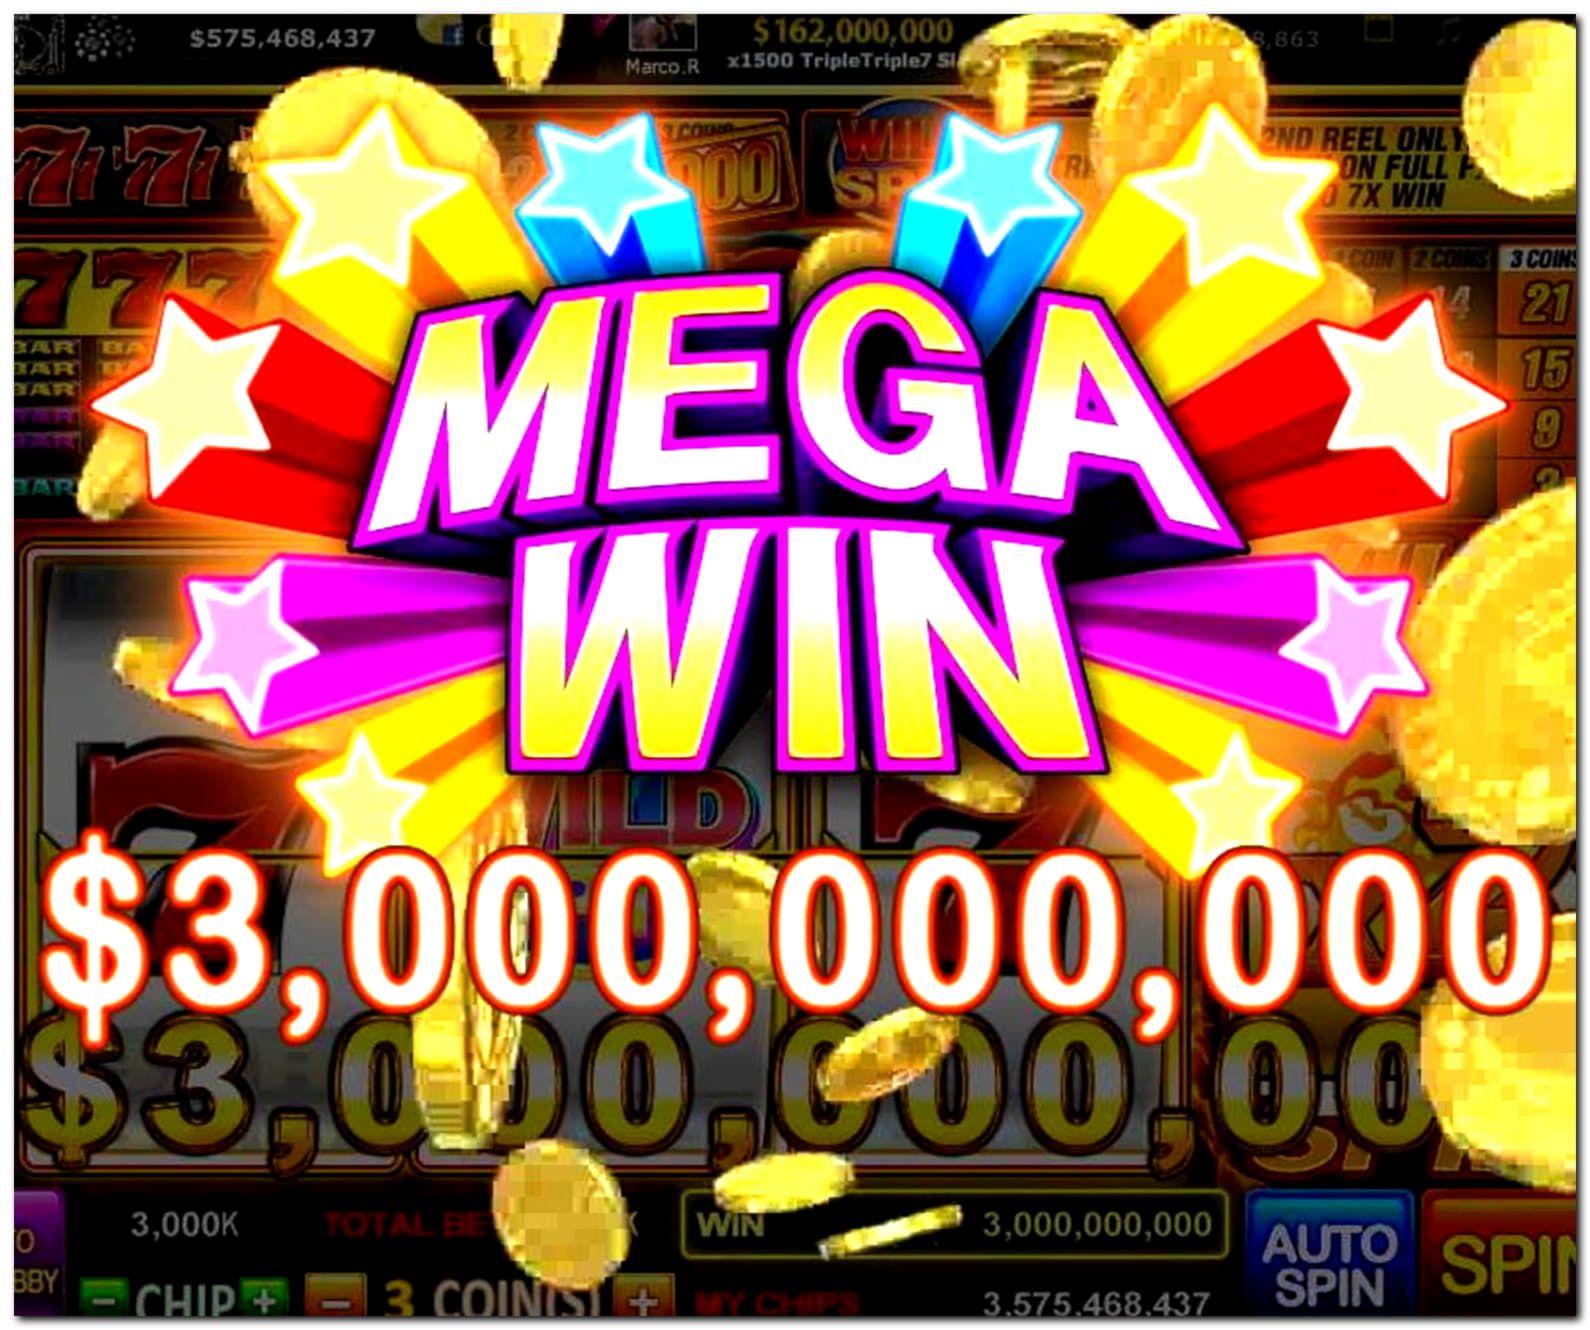 Eur 330 Mobile Freeroll Slot Tournament At Casino Com 77x Play Through Casino 846000 Max Withdrawaladditional Casino Bo Play Online Casino Online Casino Casino